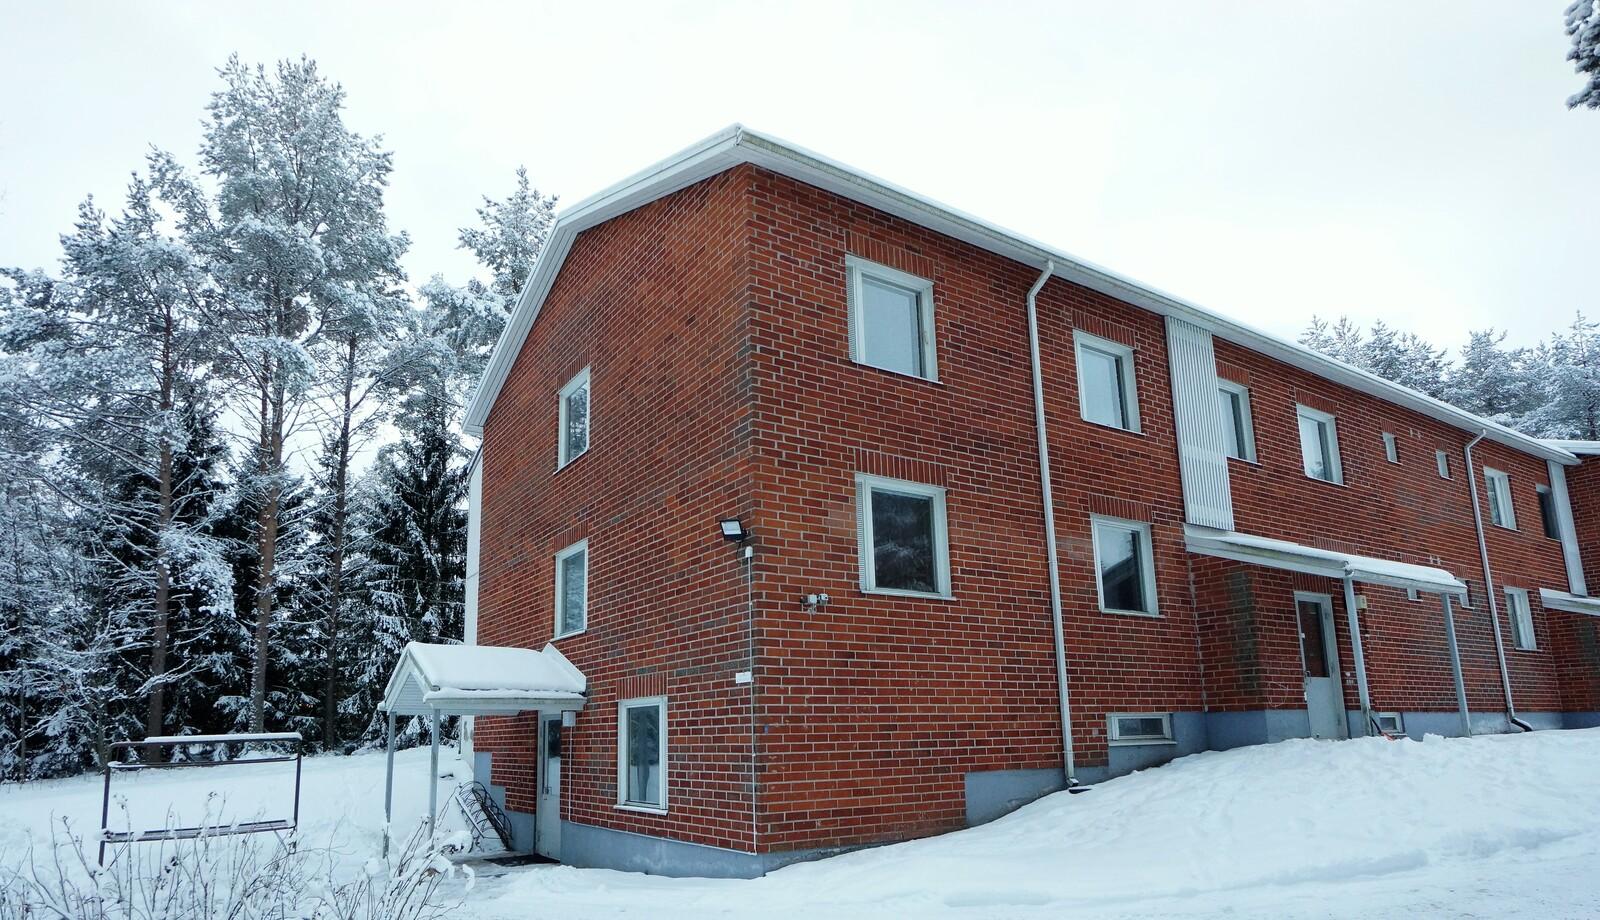 Knuutilankangas, Oulu